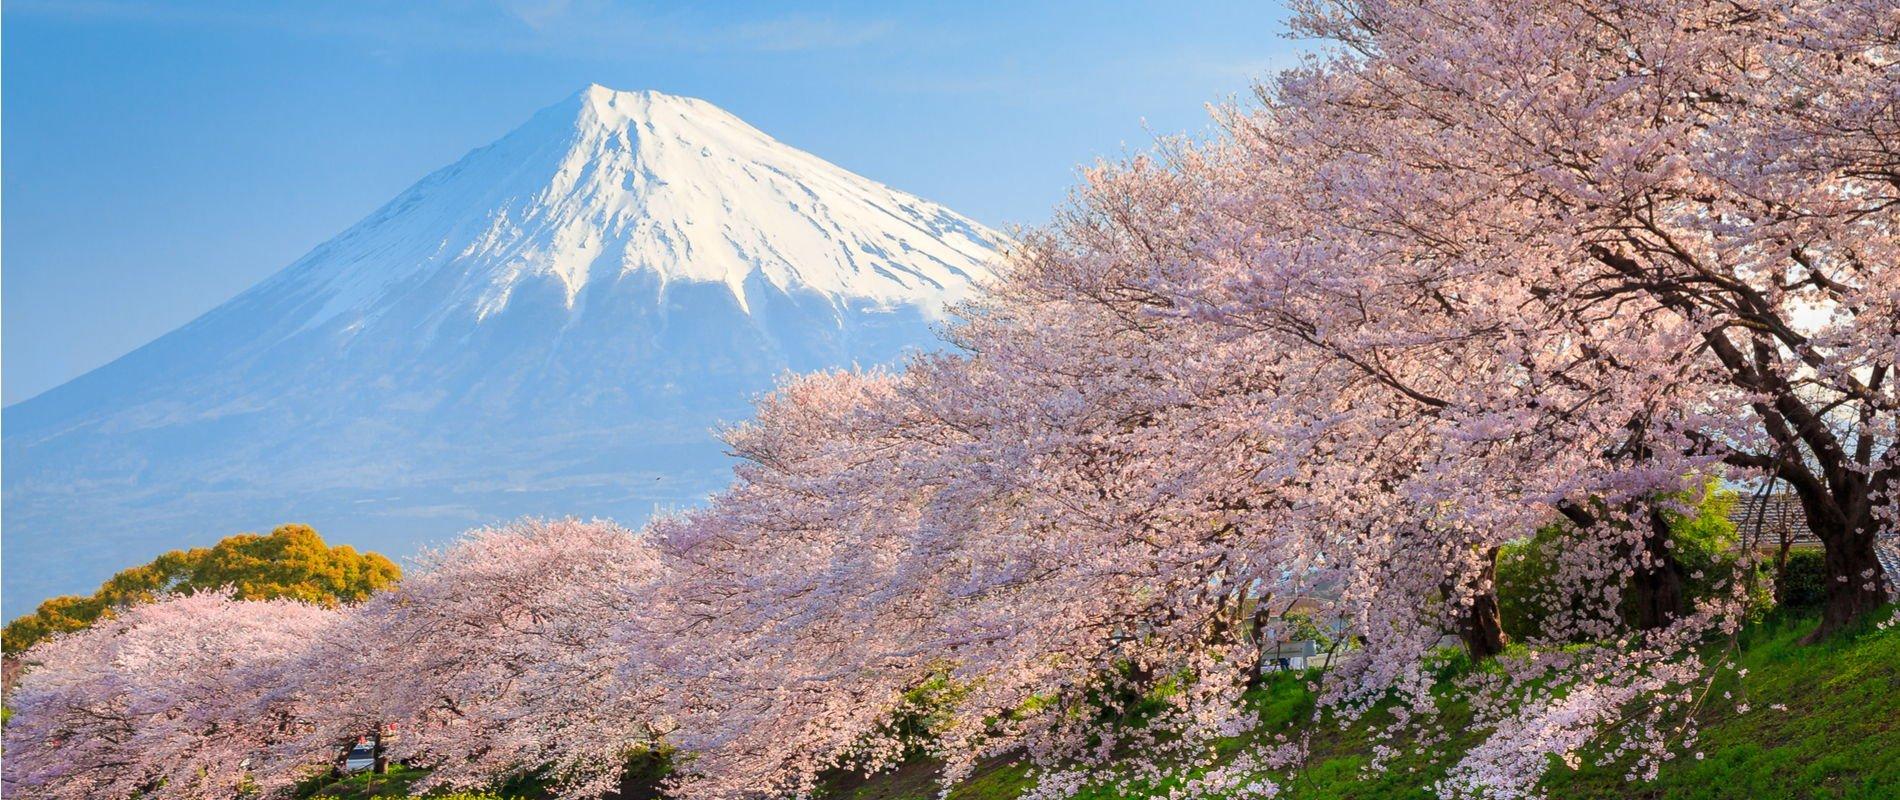 Sakura and Mountain Fuji